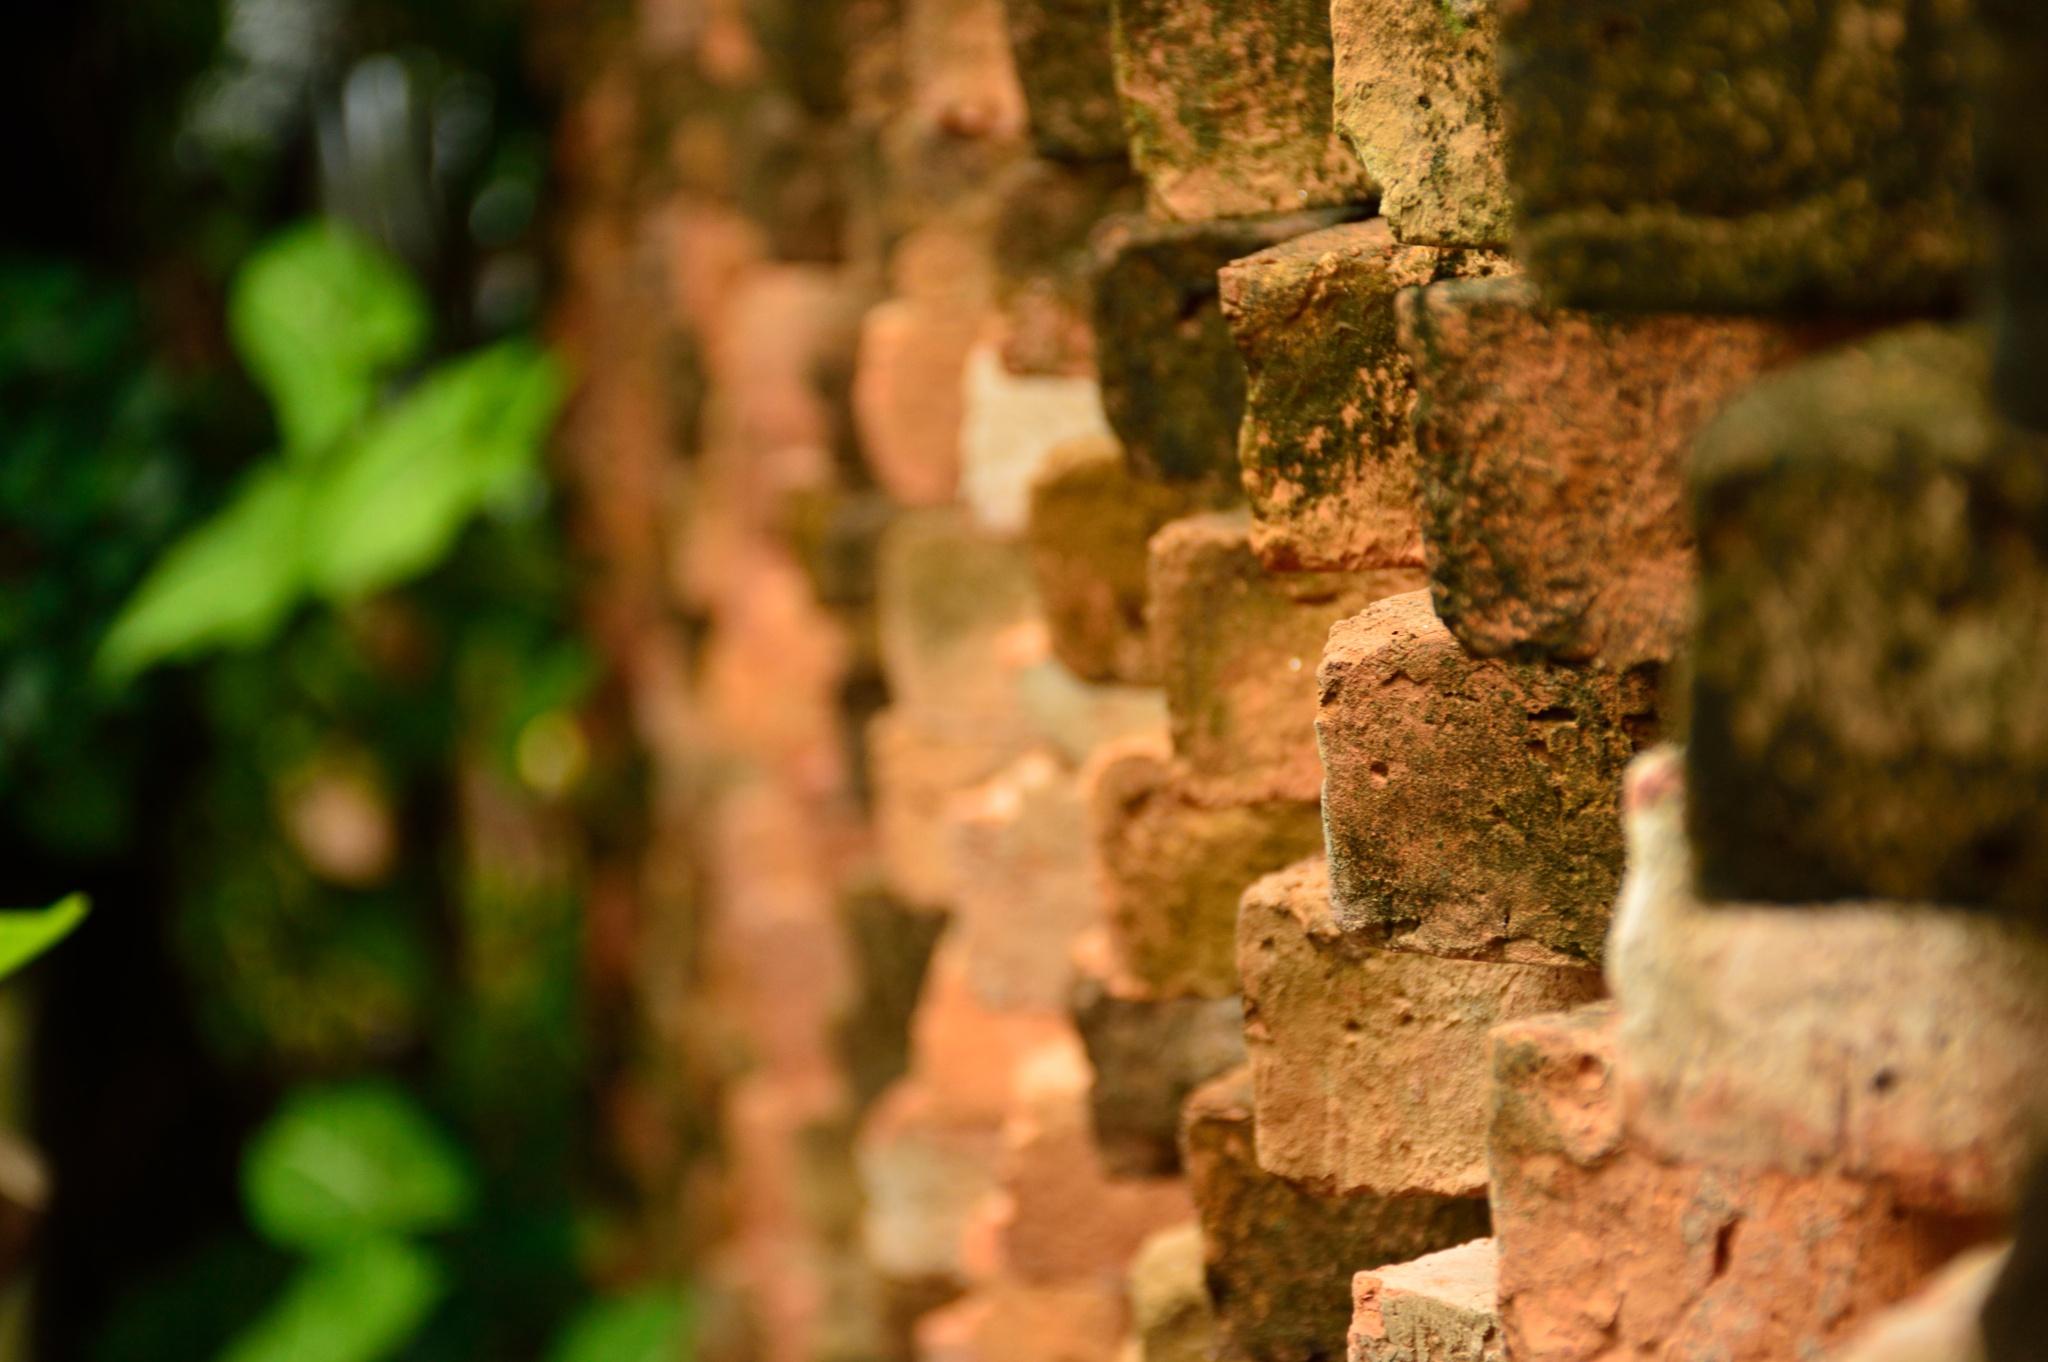 Bricks by Laszlo Ecsedi